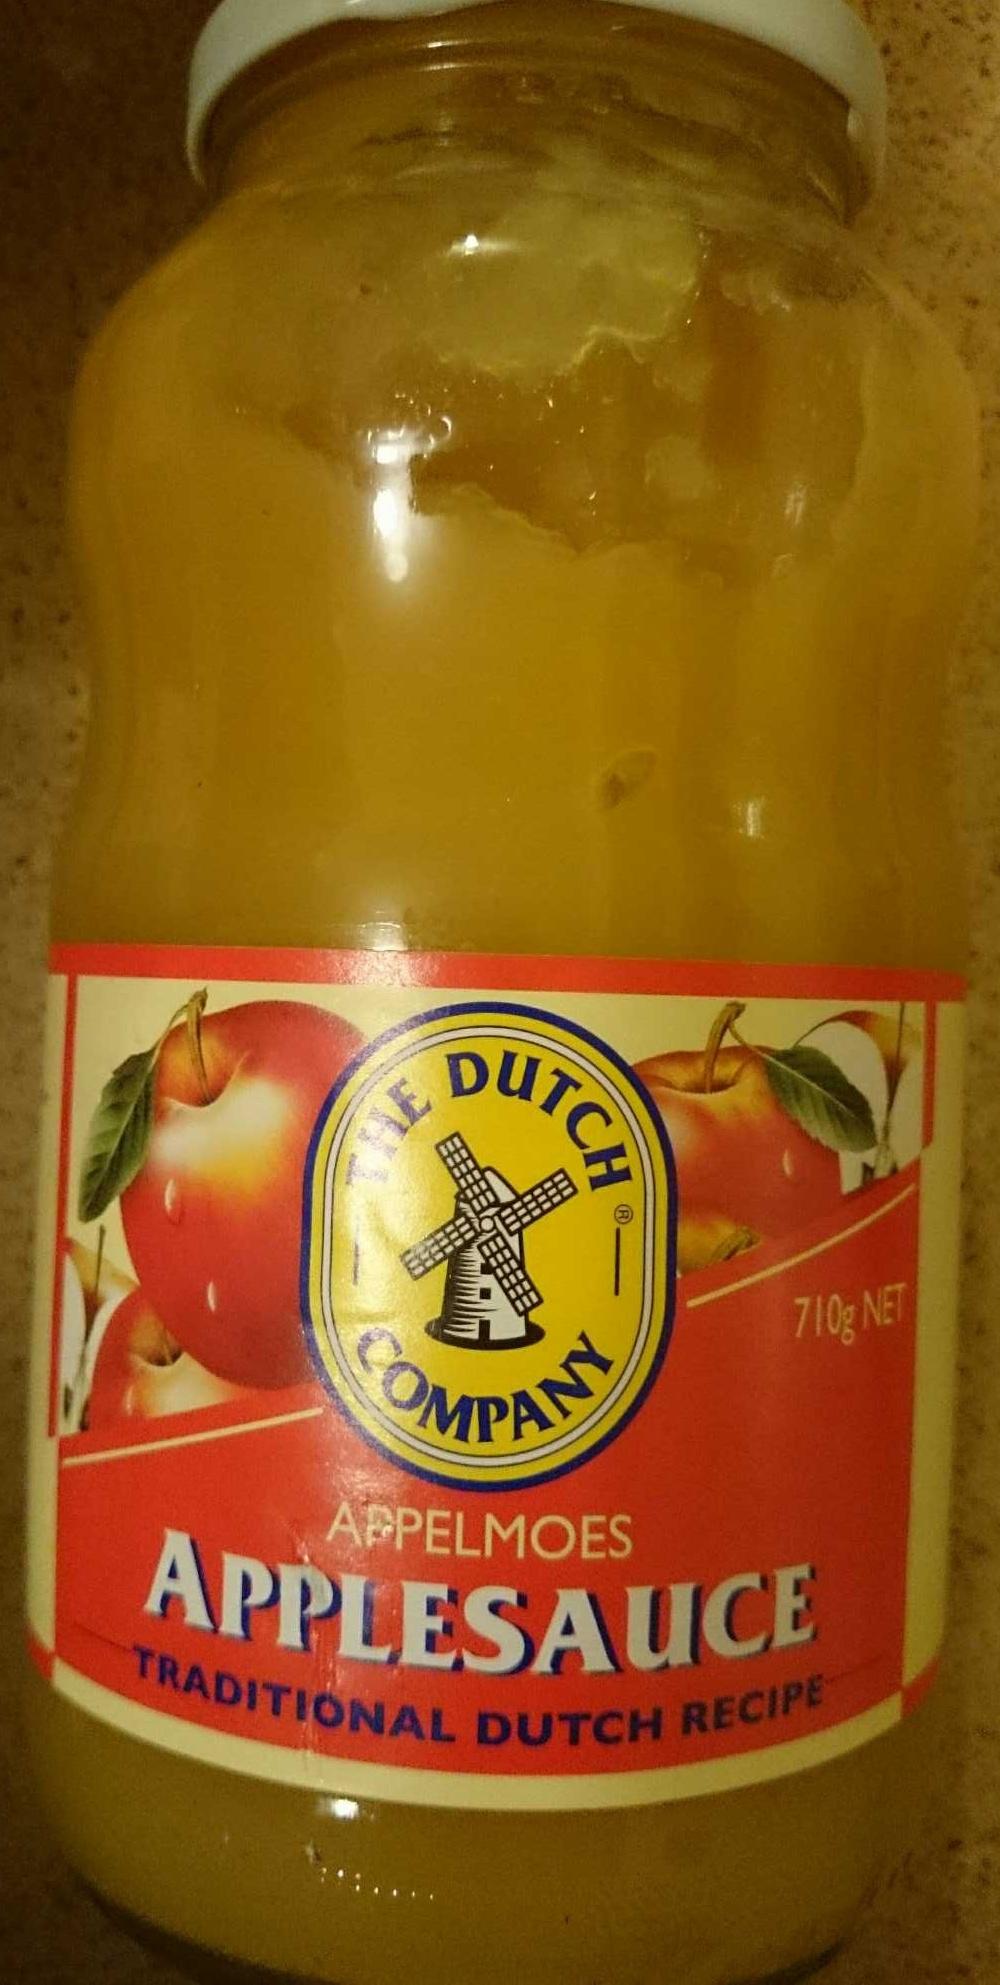 Appelmoes Applesauce Traditional Dutch Recipe - Product - en